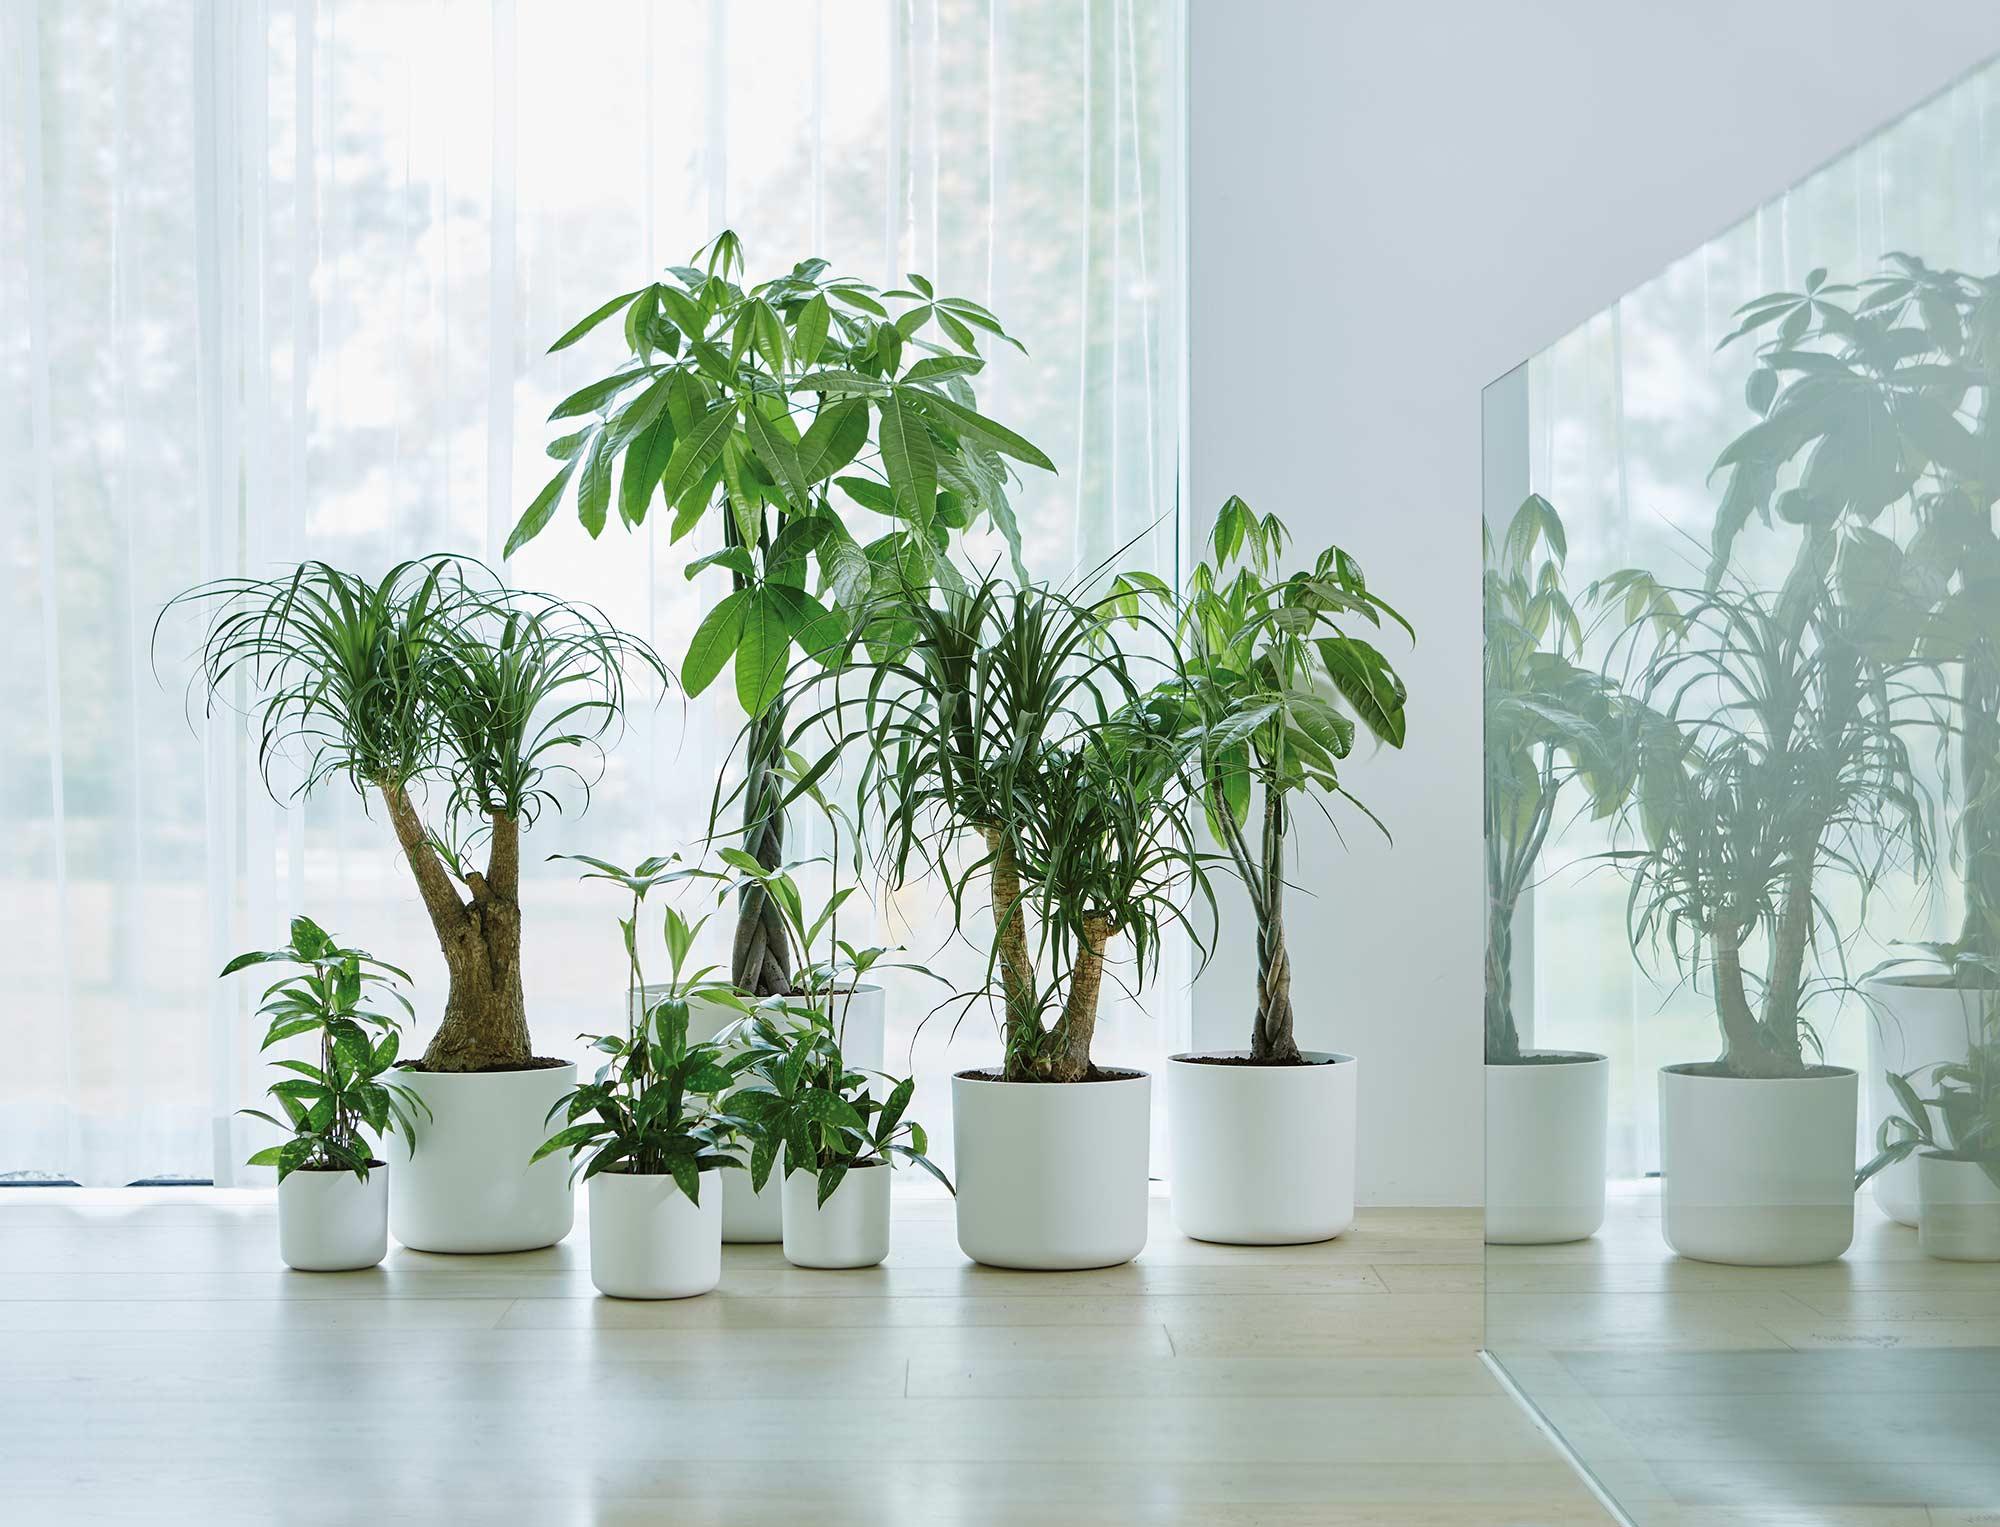 planten verzameling